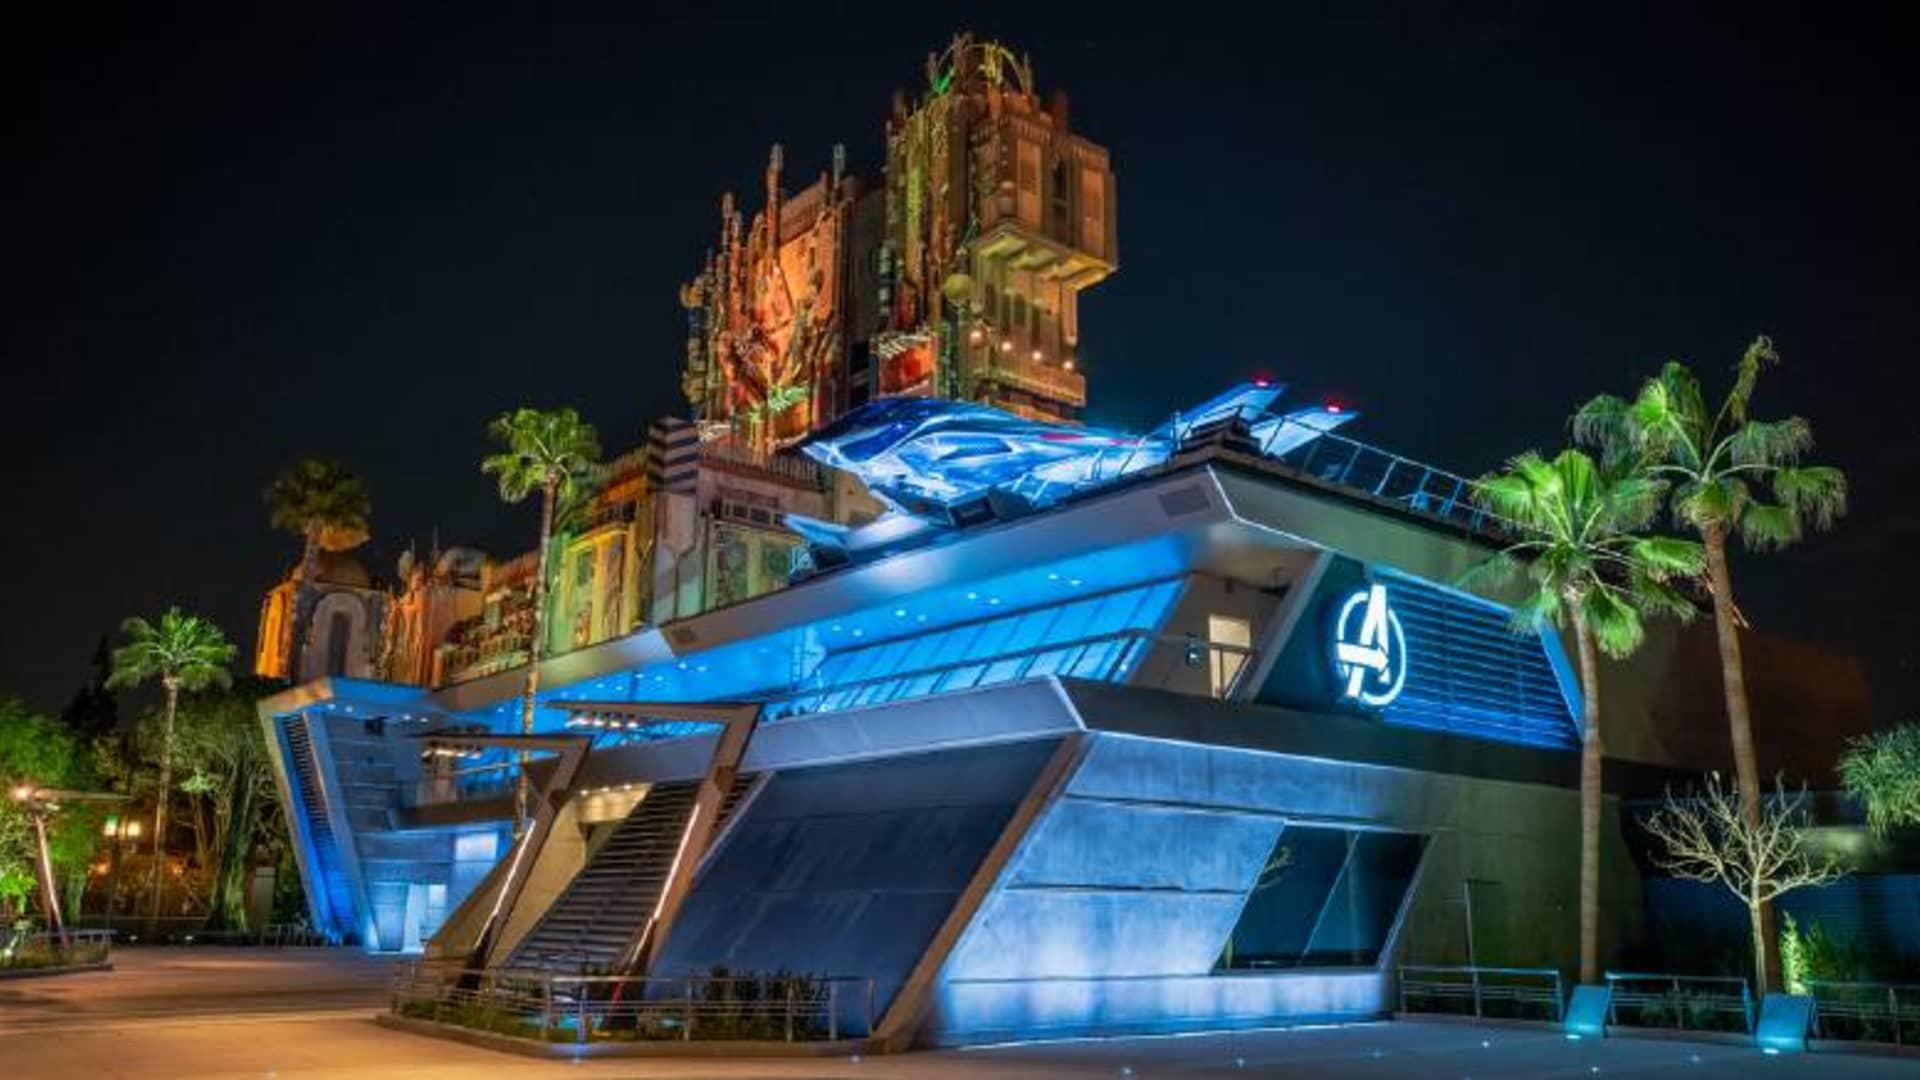 The Avengers Campus park land in Disney California Adventure in Anaheim, California.